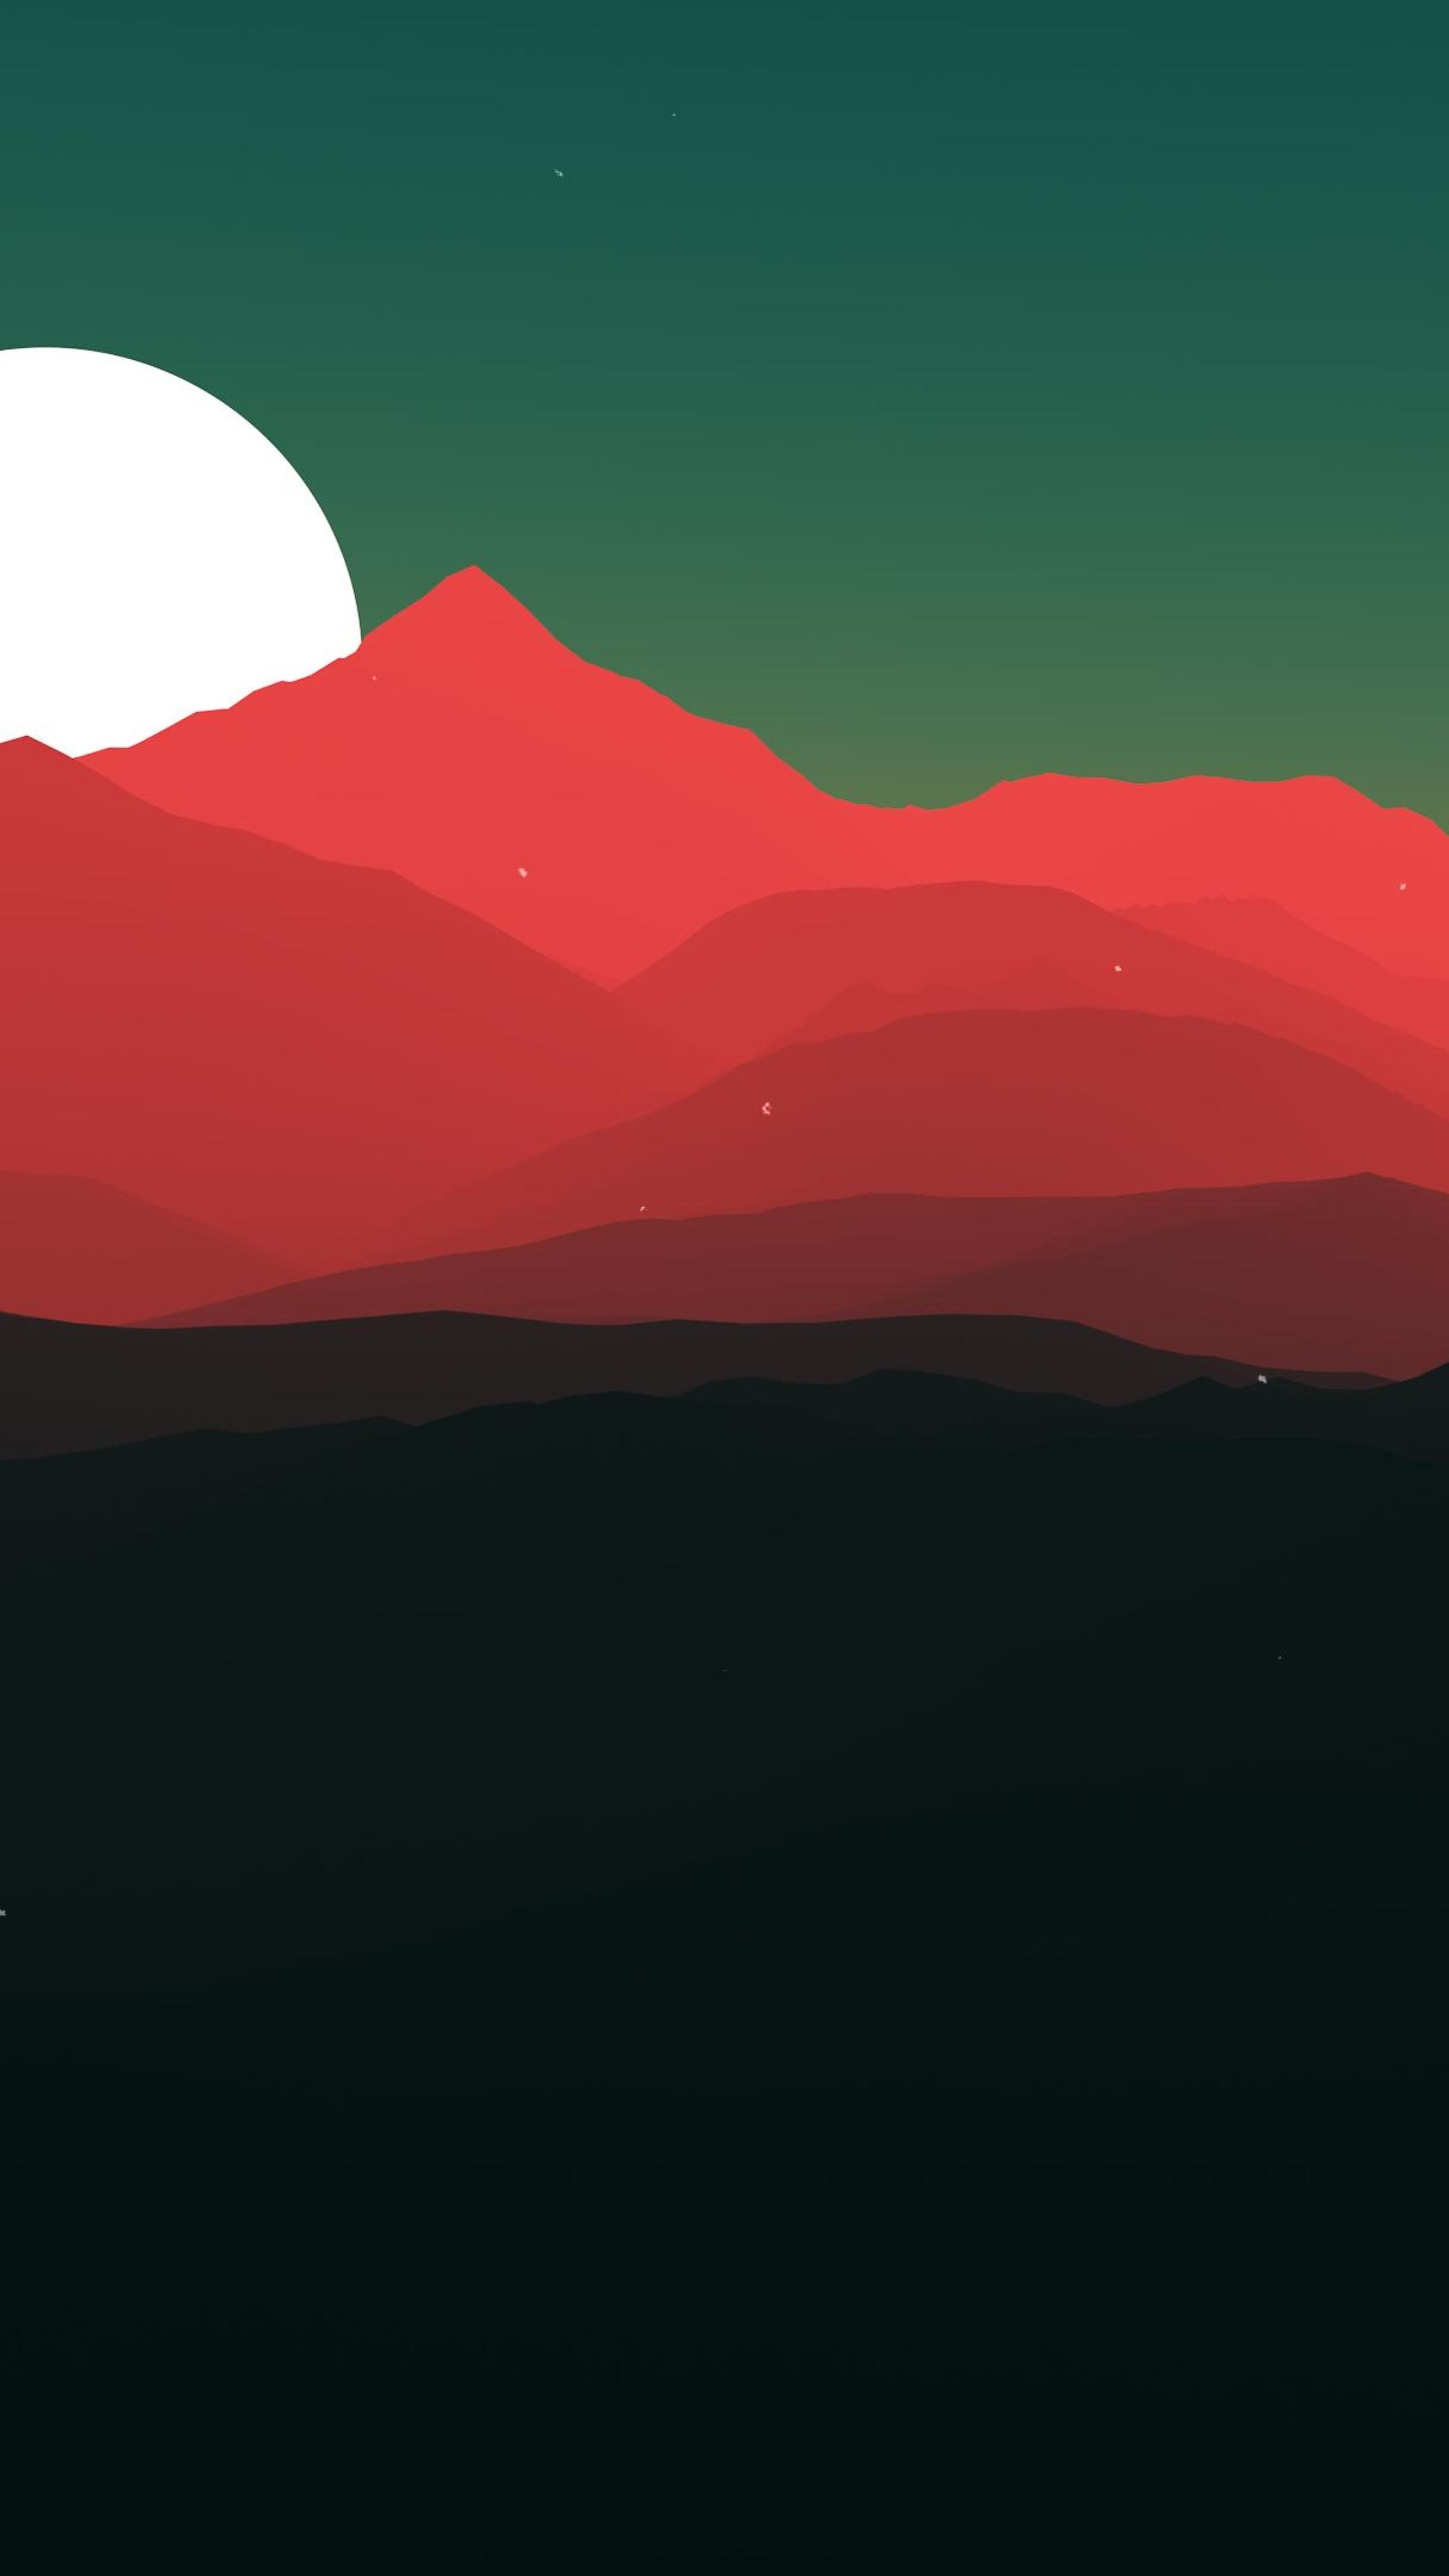 Minimalist Landscape Hd 4k Wallpaper